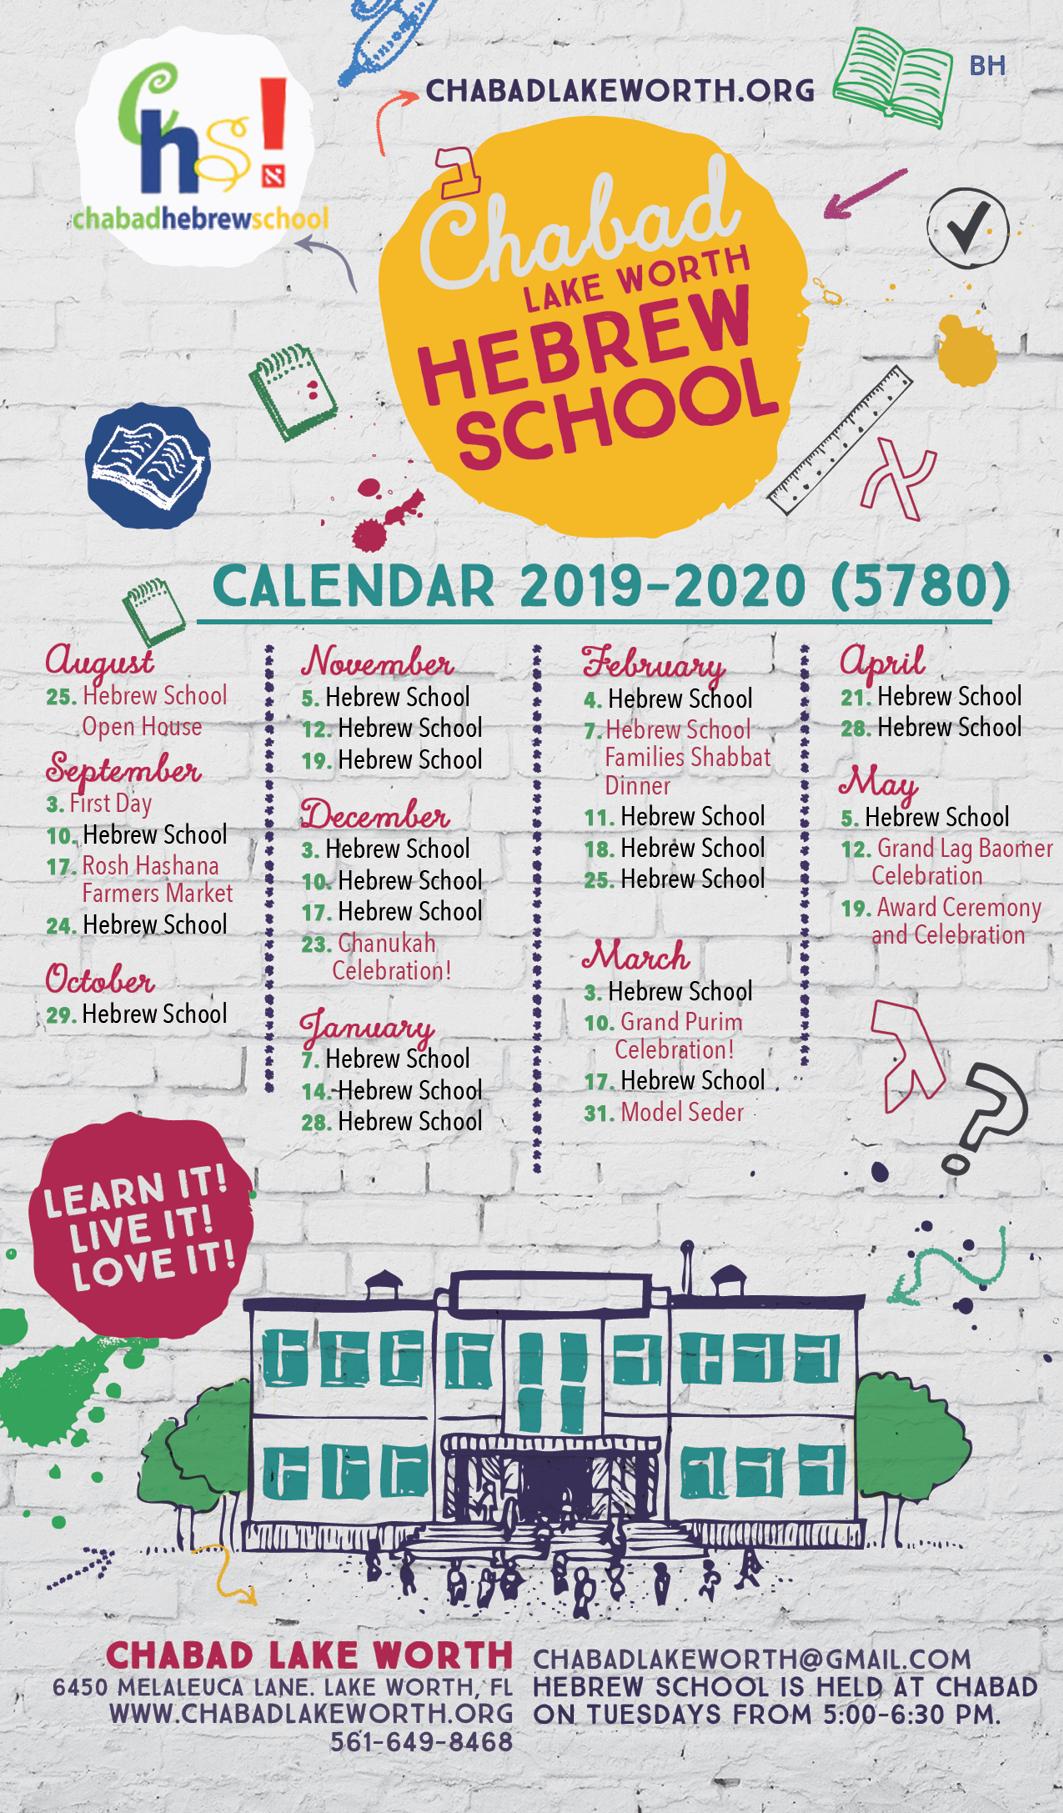 Calendar 2019- 2020 - Chabad of Lake Worth